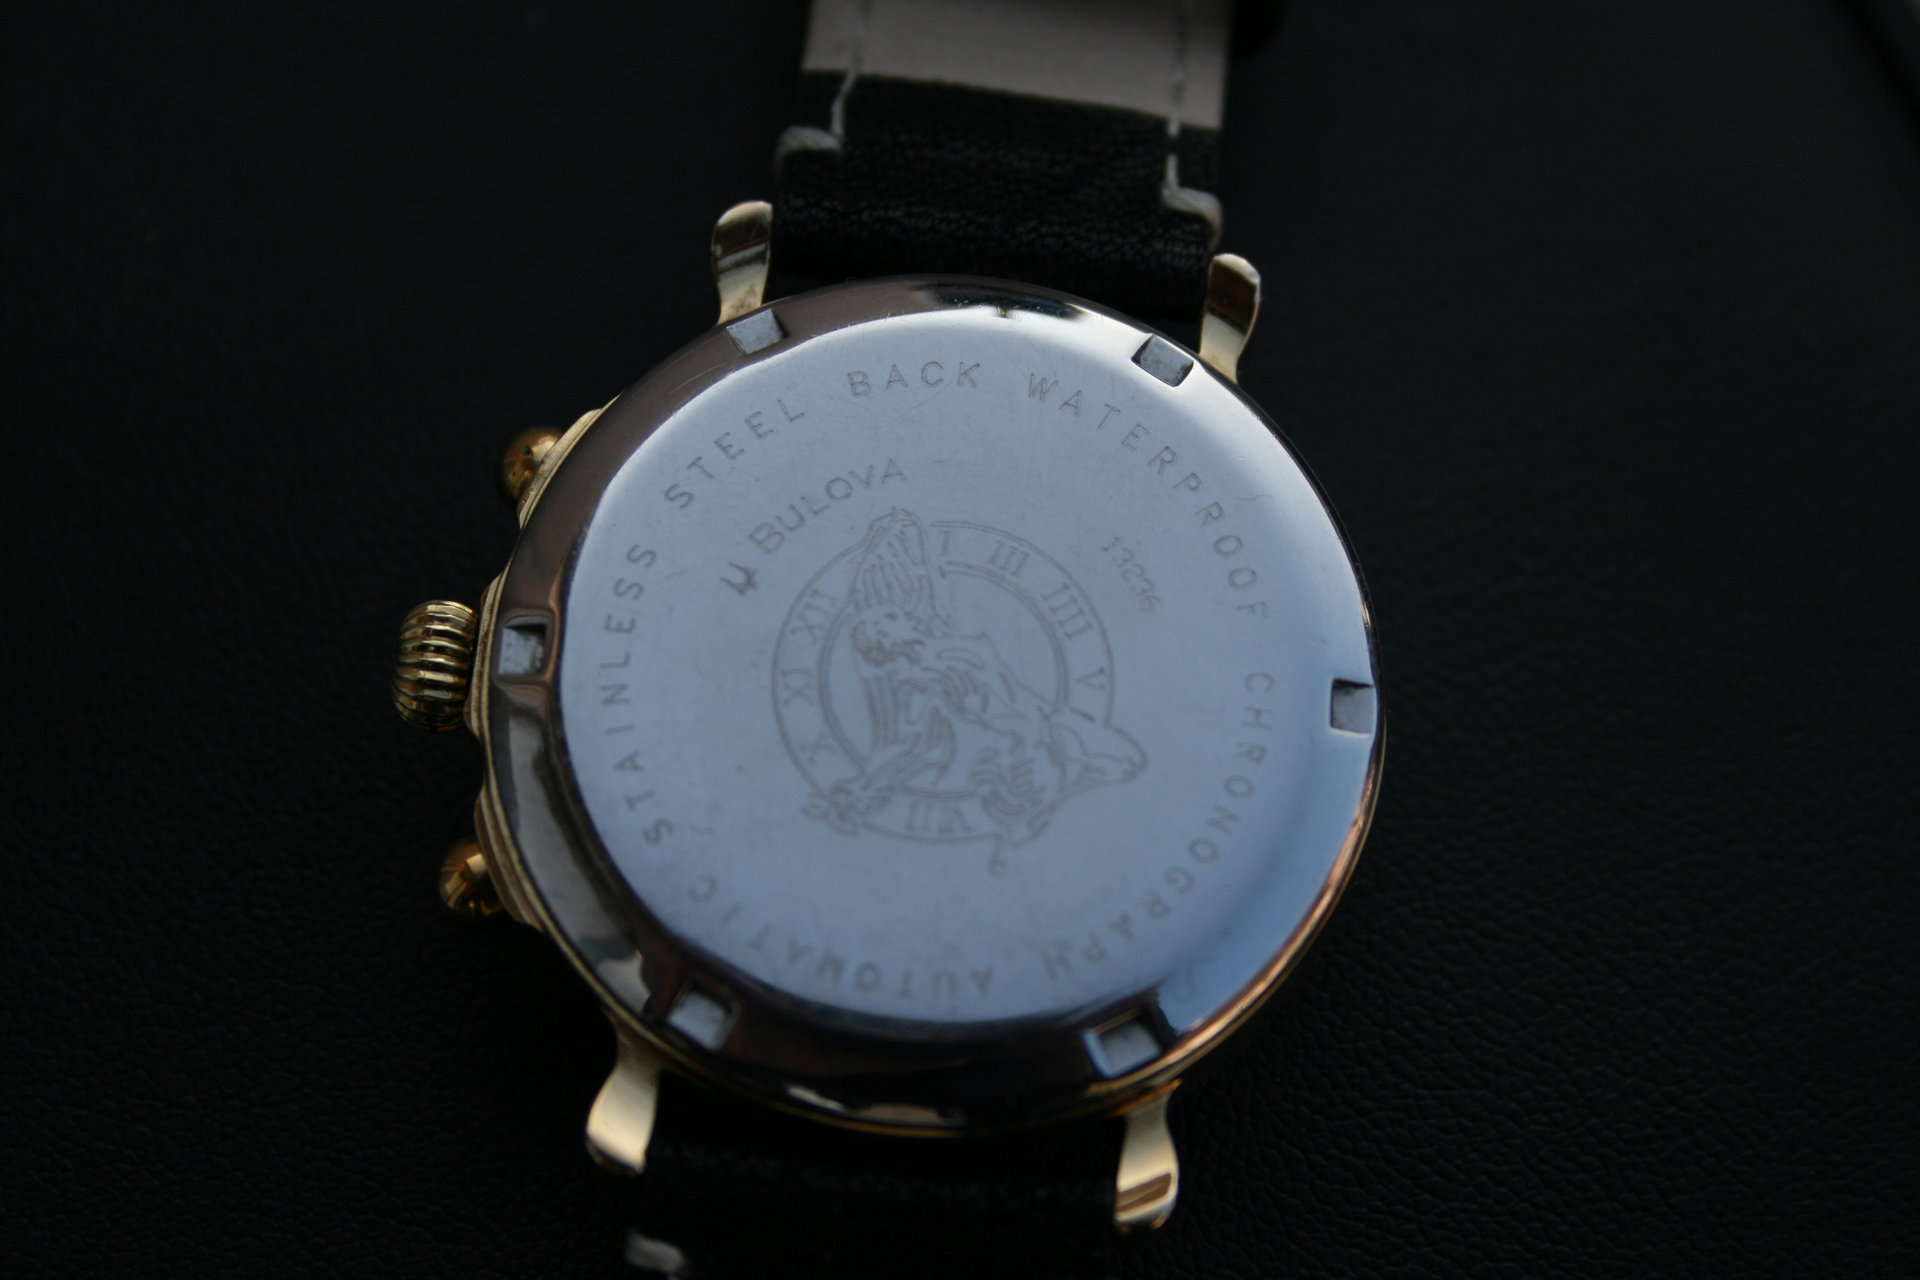 Erledigt] - Bulova Chronograph Automatik mit Valjoux 7750 | UhrForum